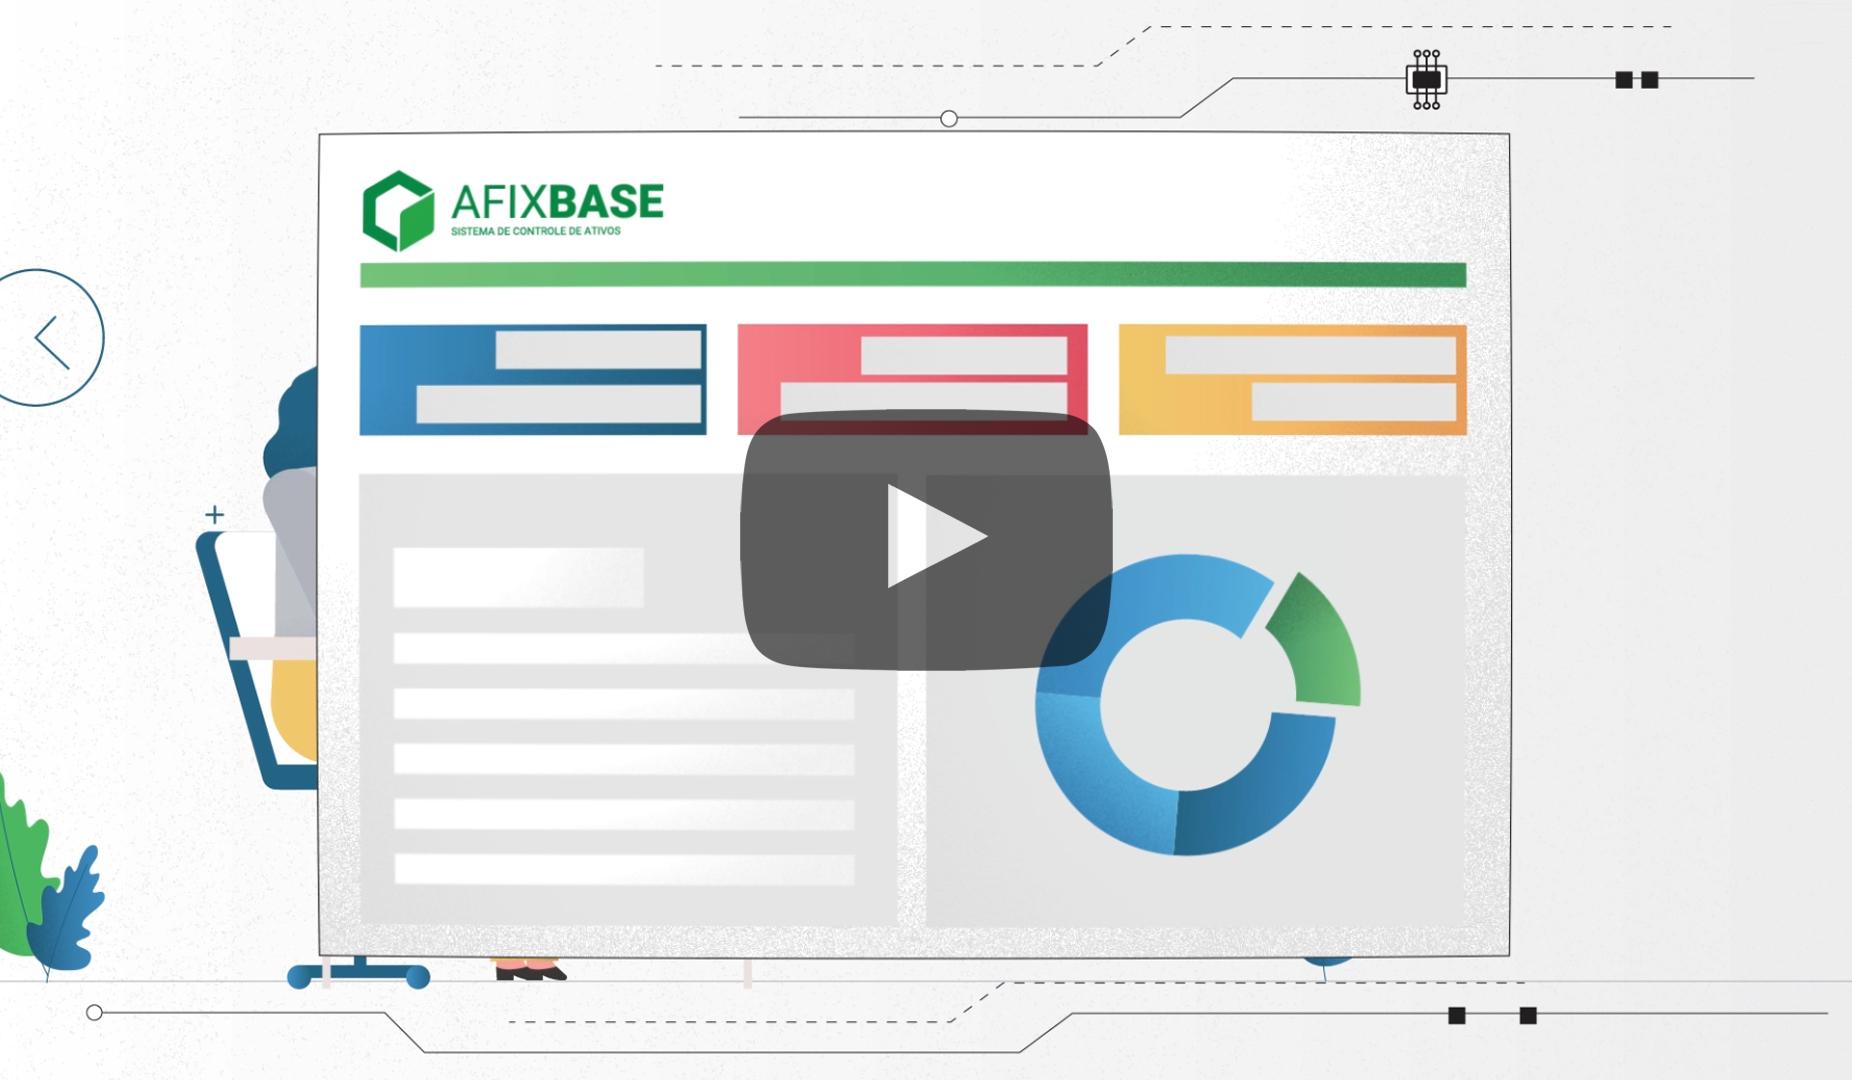 Afixbase - Vídeo Institucional